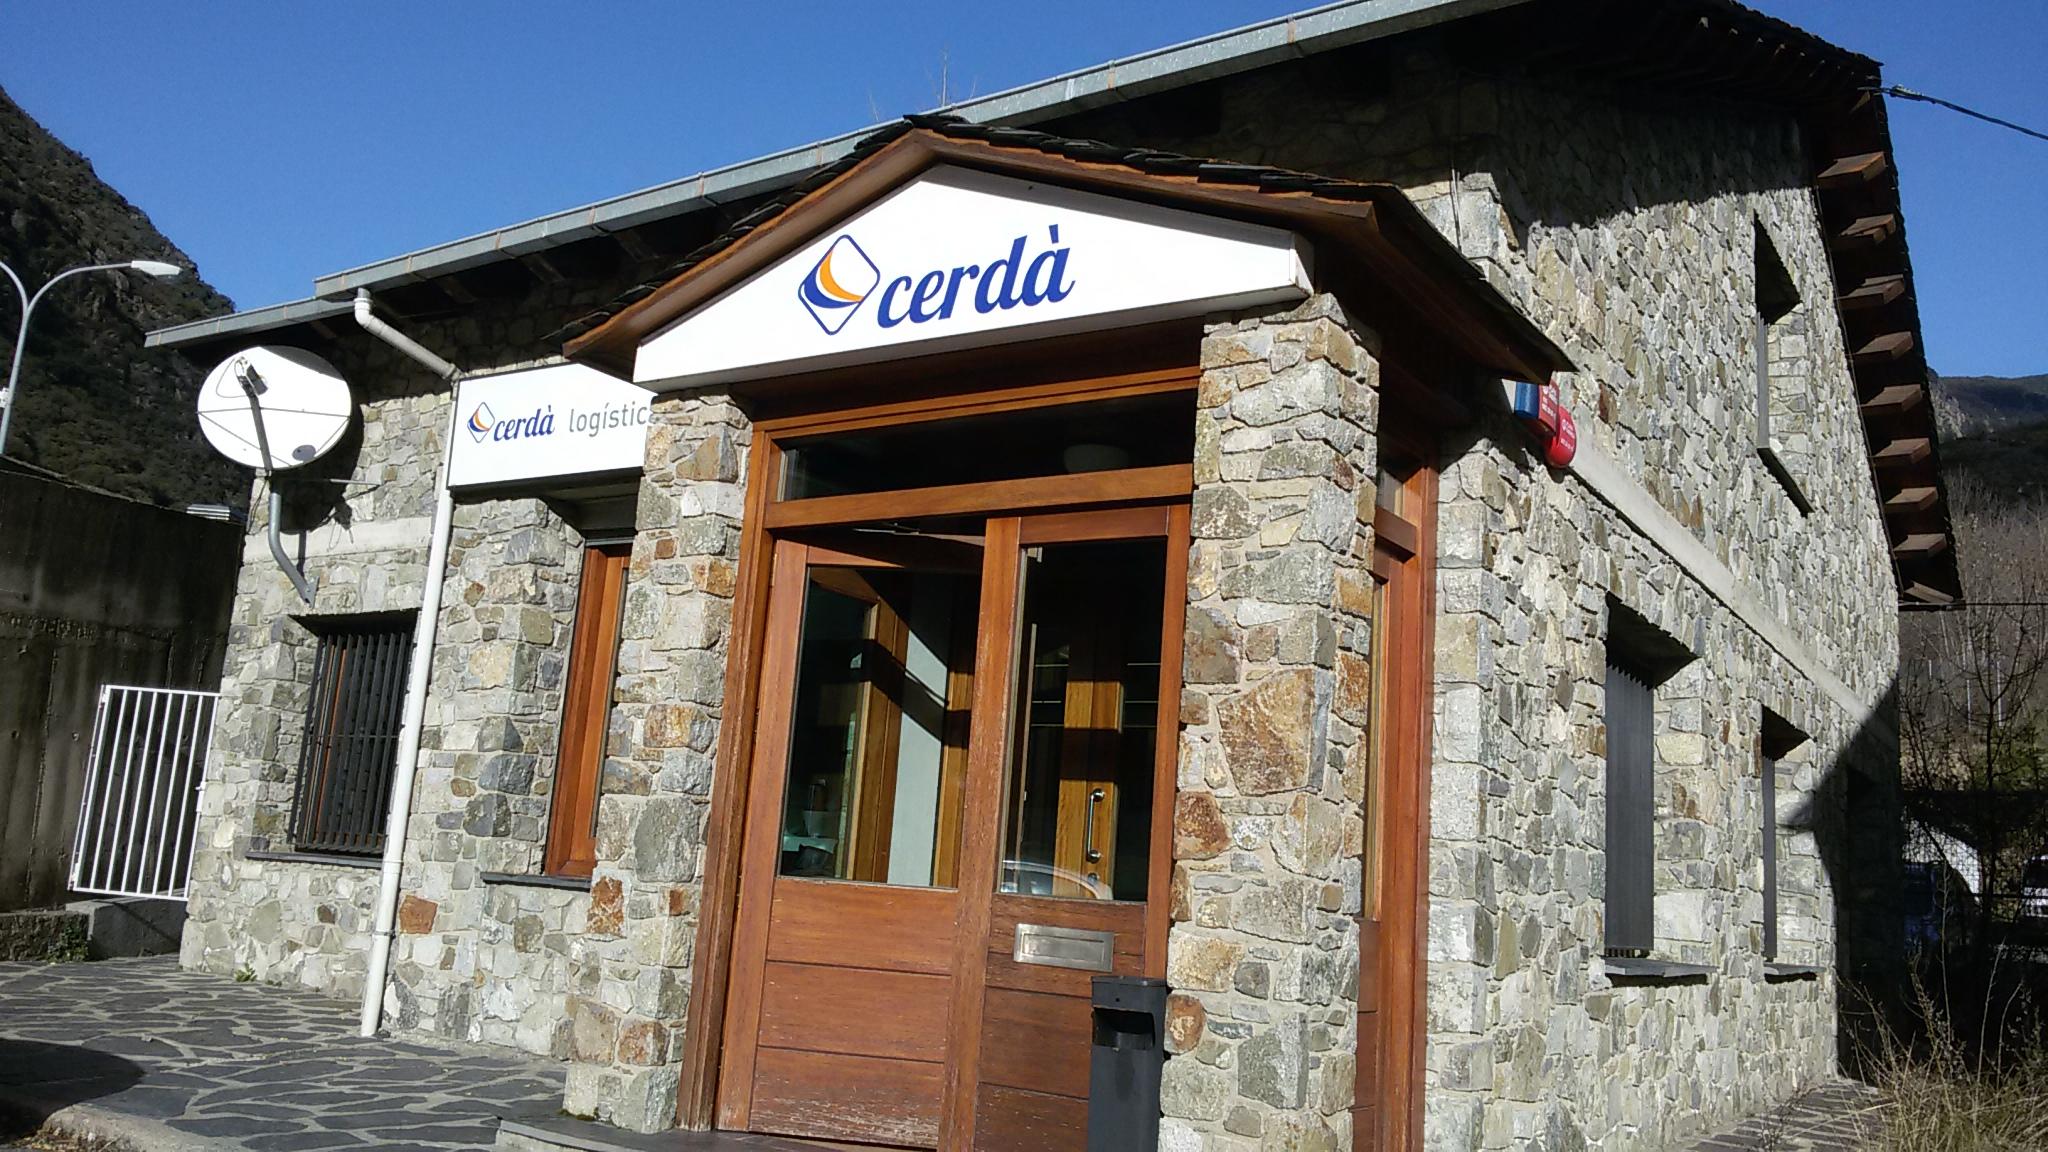 Exterior Oficina Aduanas Cerdà